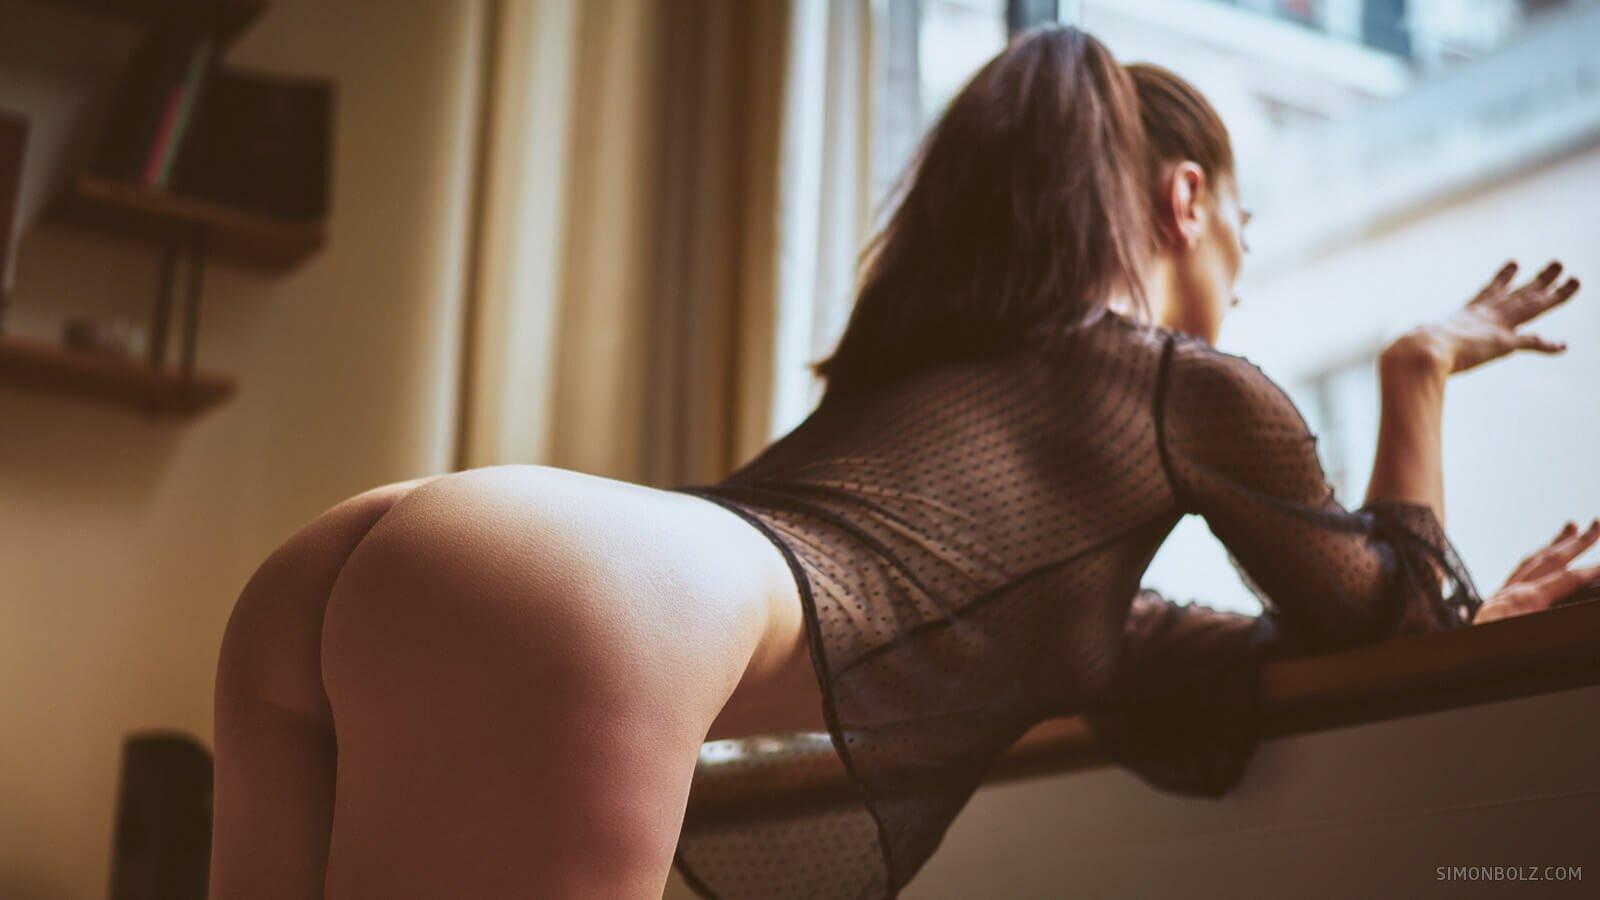 Scarlett / Photographed by Simon Bolz